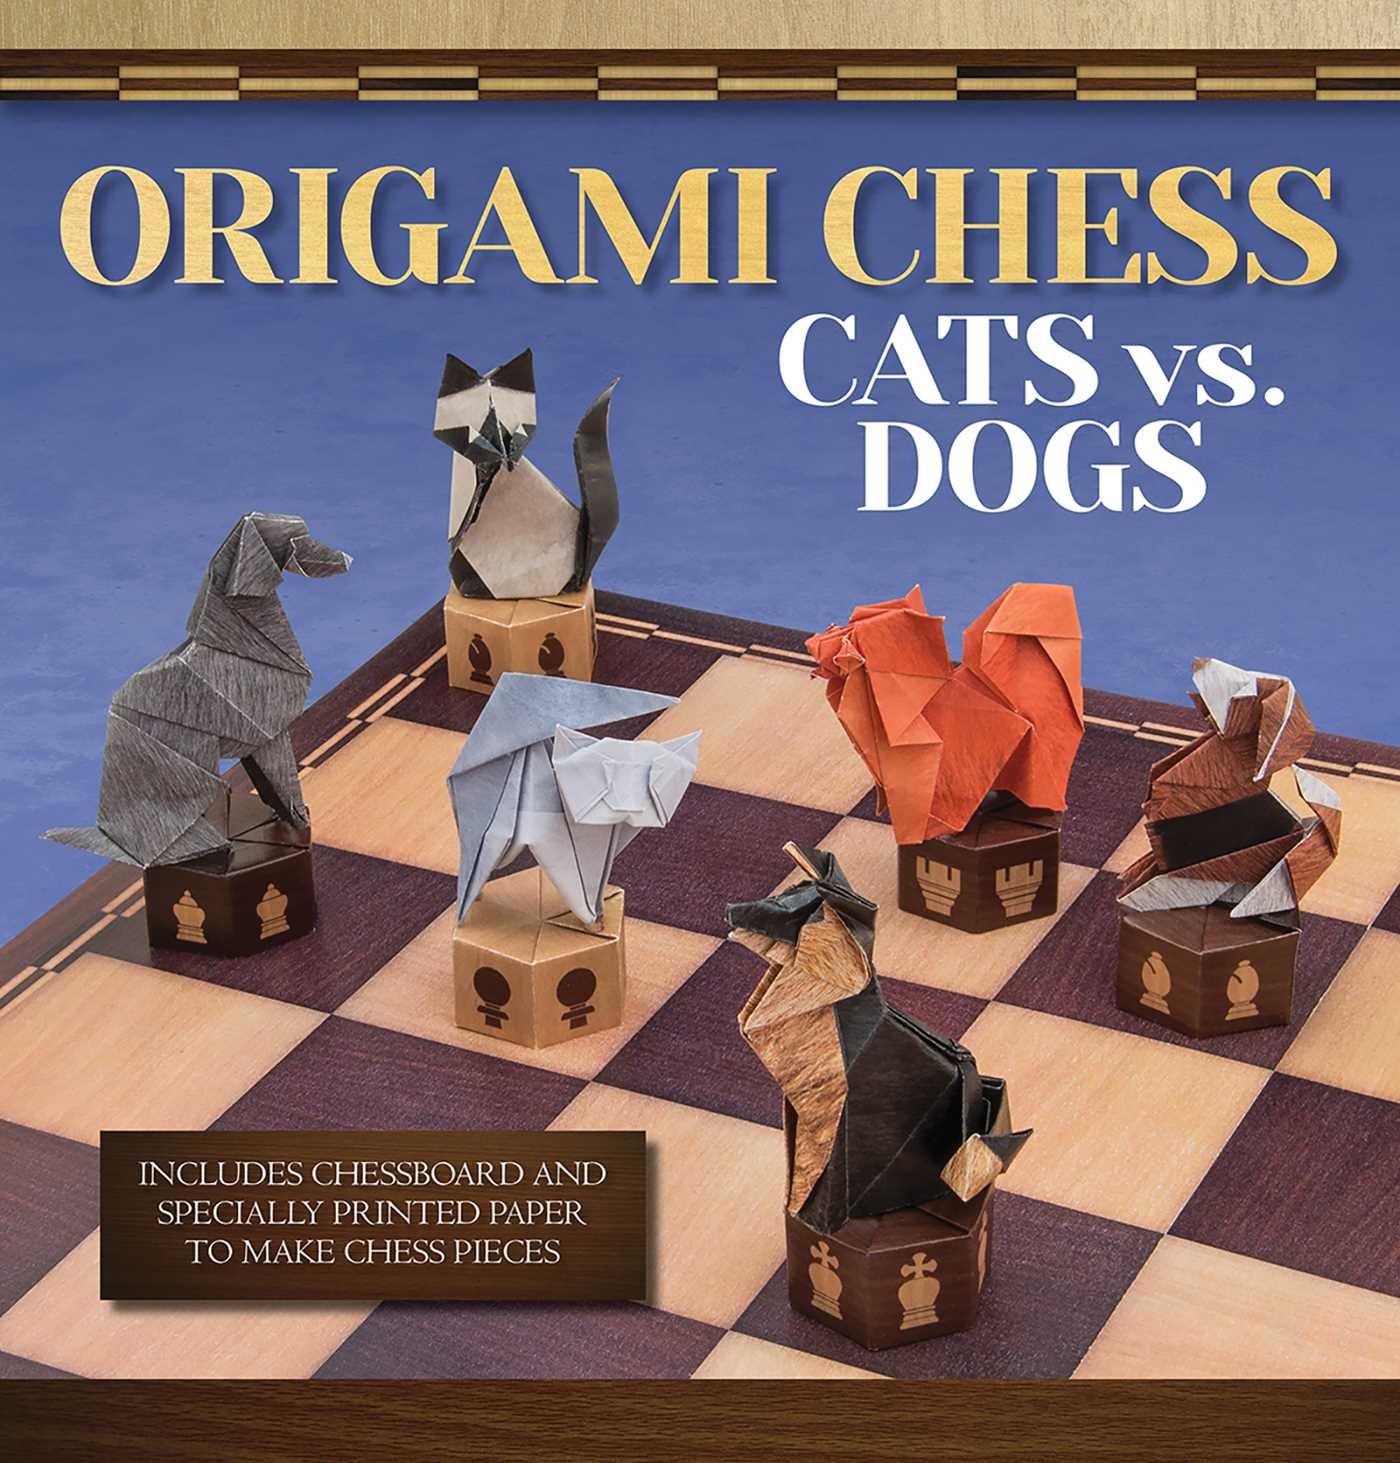 Origami Chess Cats Vs Dogs Books Roman Diaz Dog Diagram 9781626861718